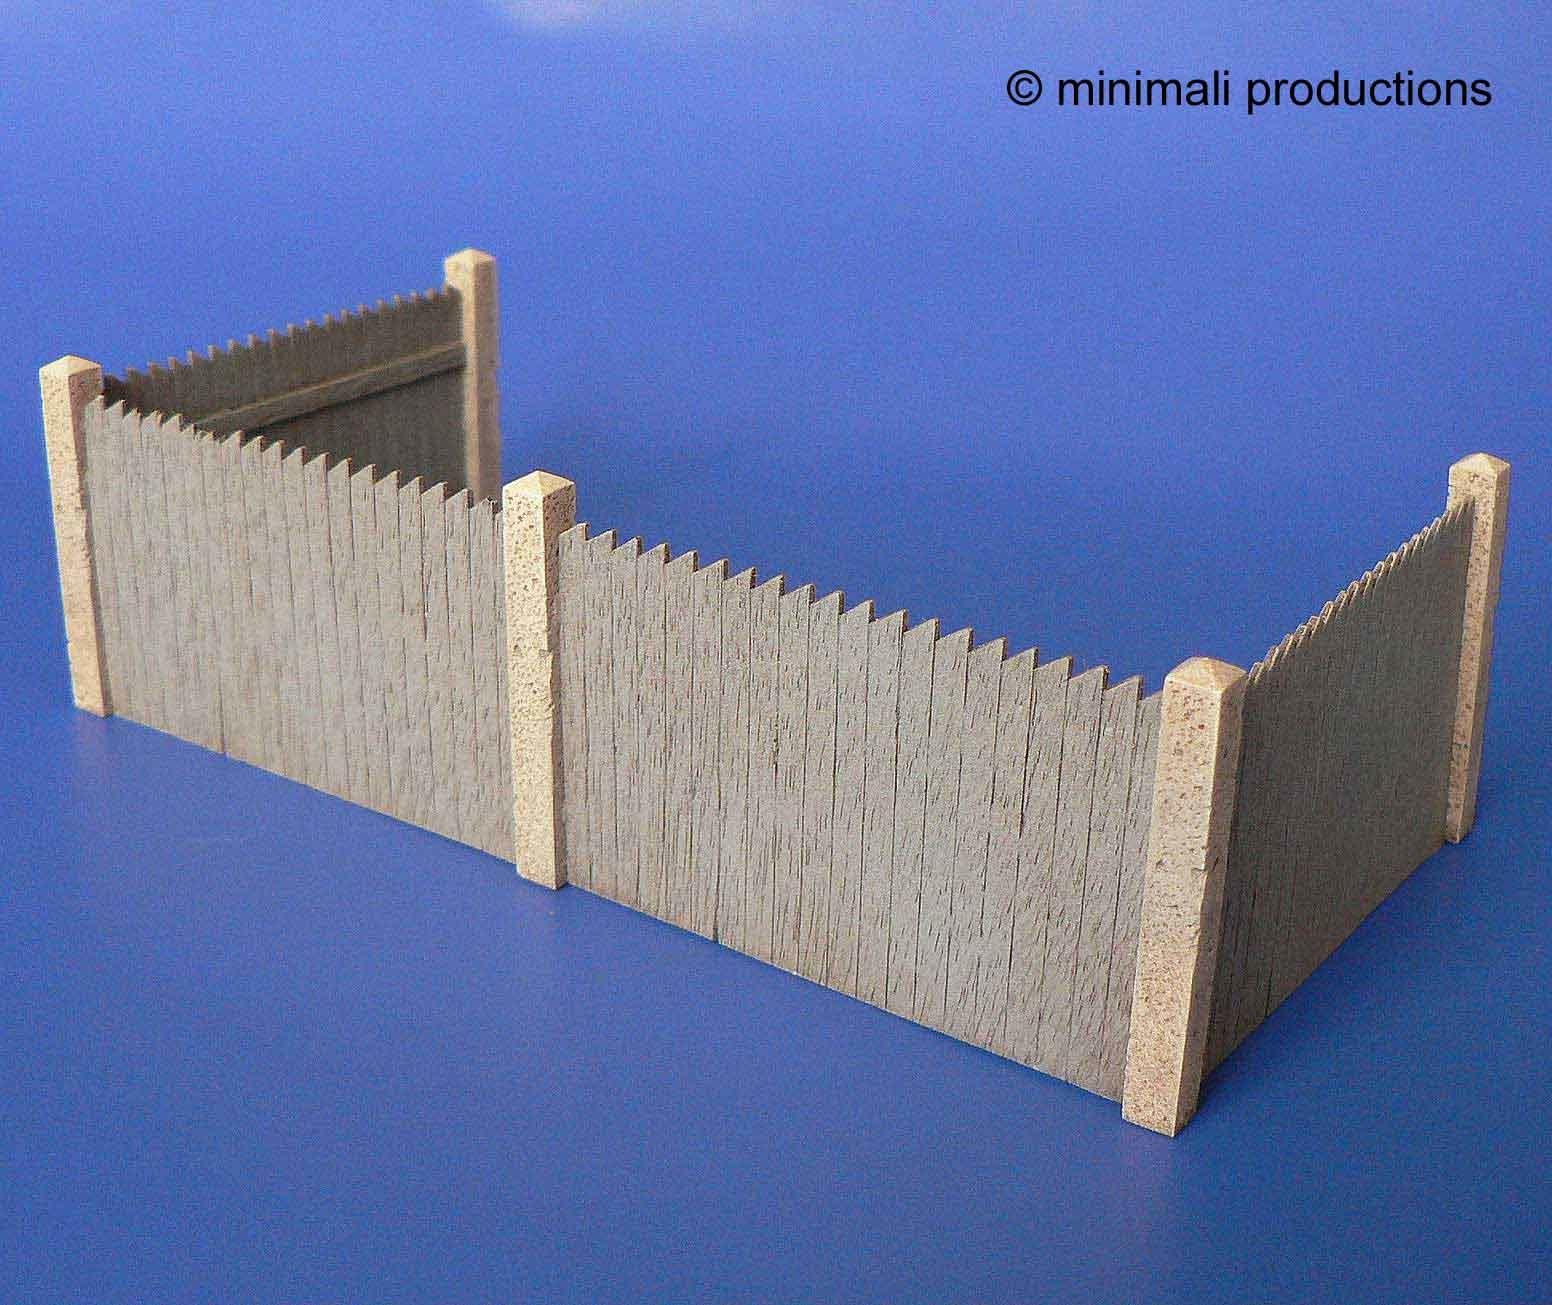 Minimali Productions Wooden Corral - Scale 1/48 - Minimali Productions - Mii 023